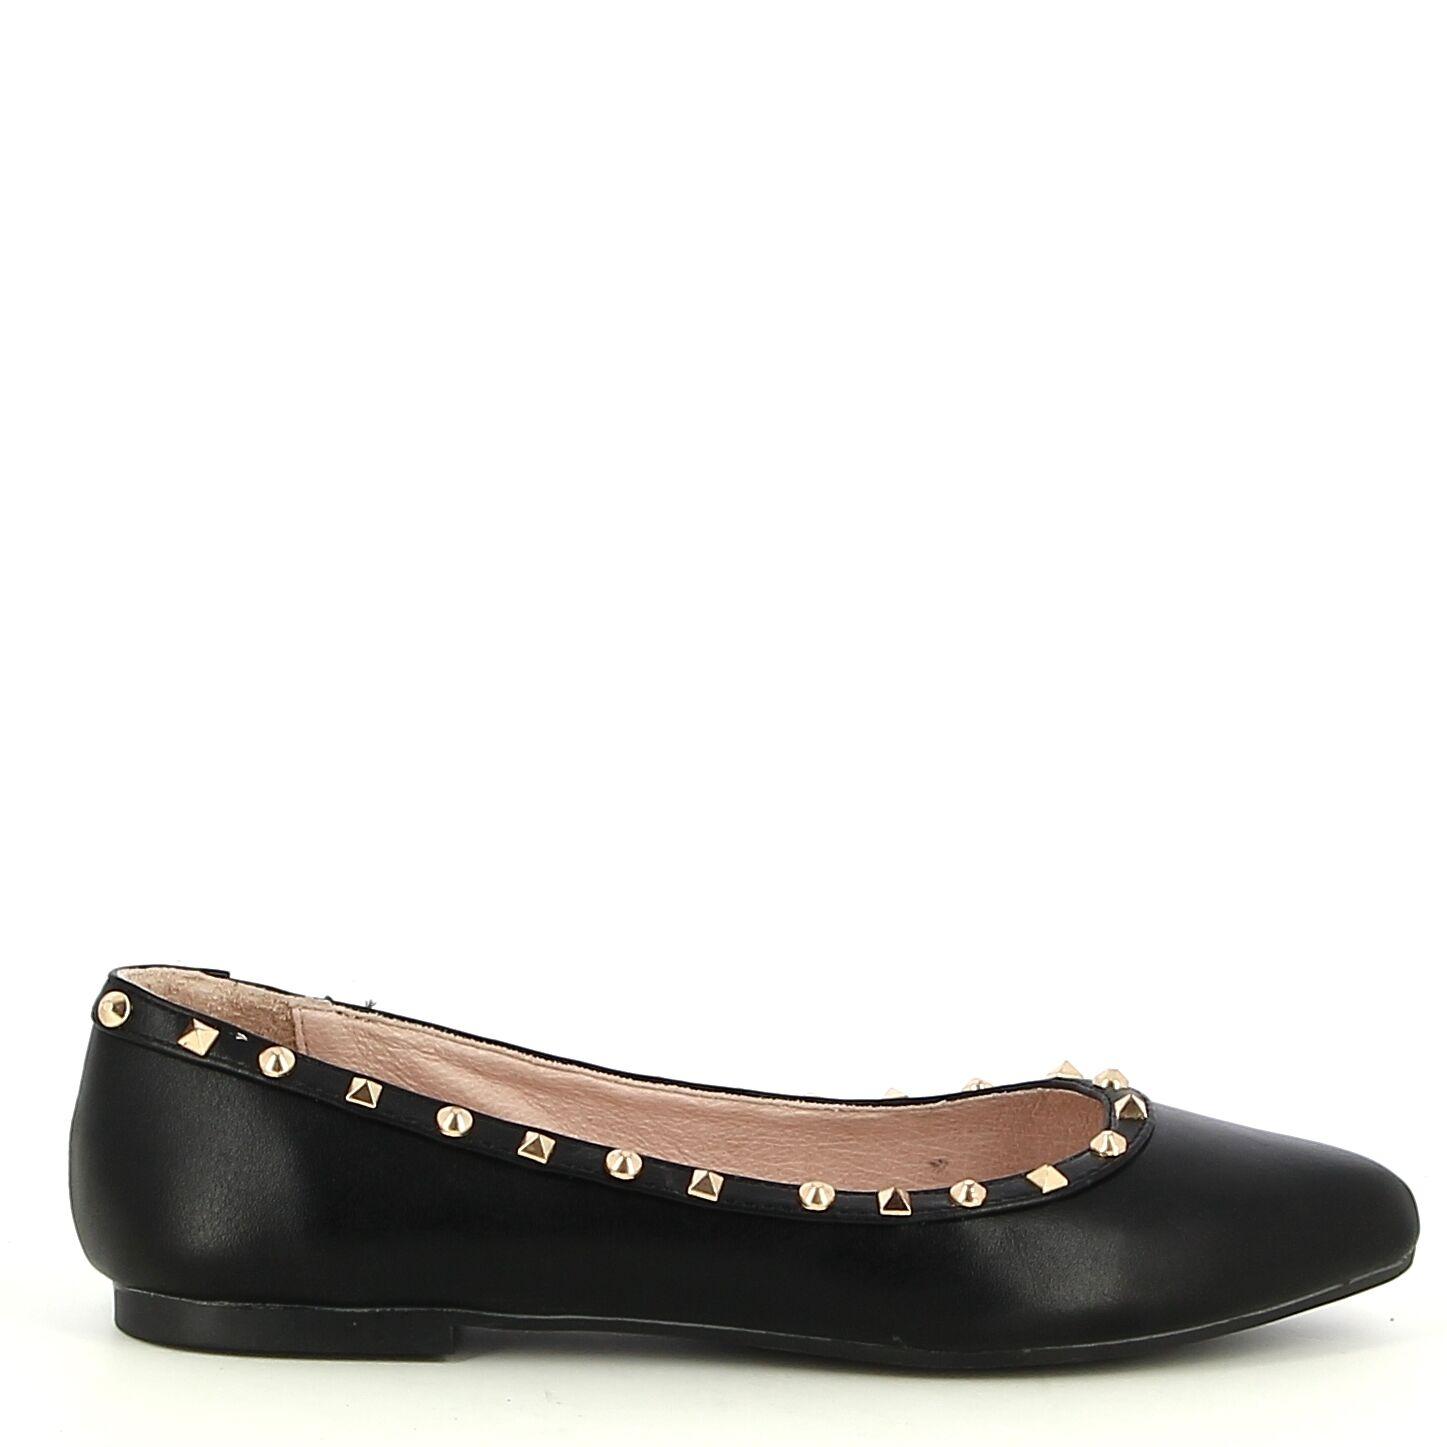 Ken Shoe Fashion - Ballerines - Noir avec strass